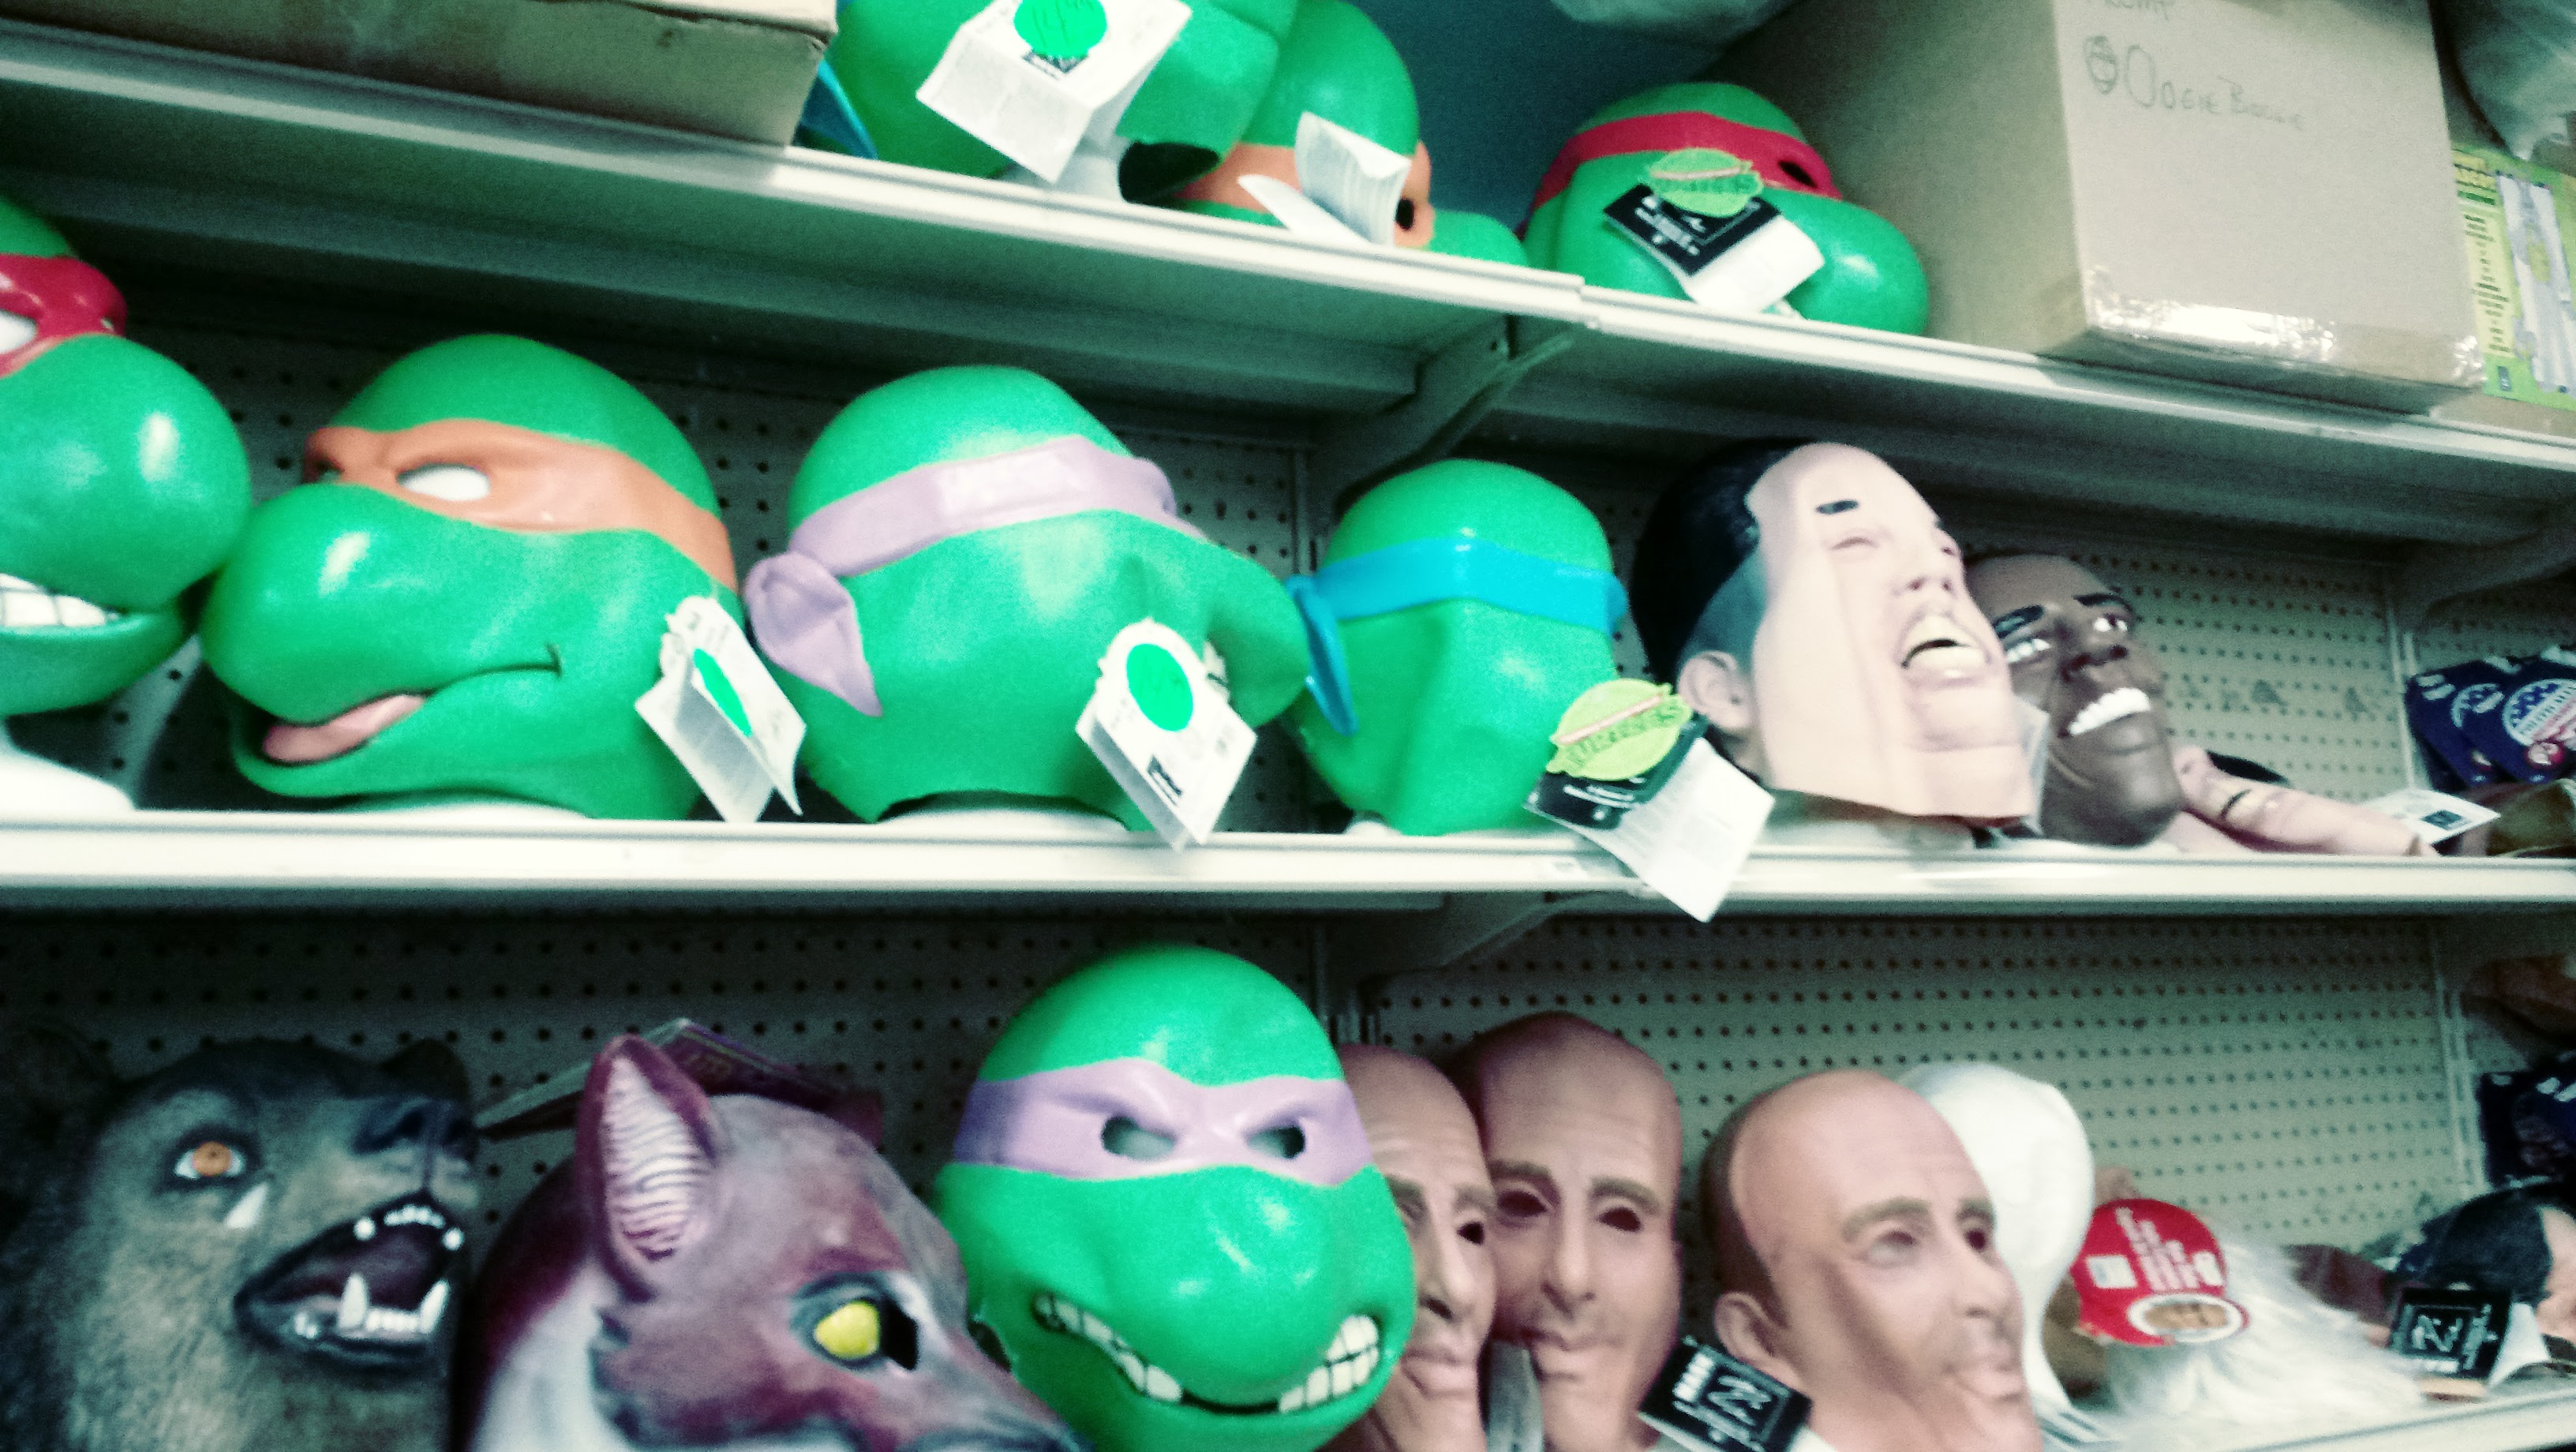 nick nackery tmnt and political masks